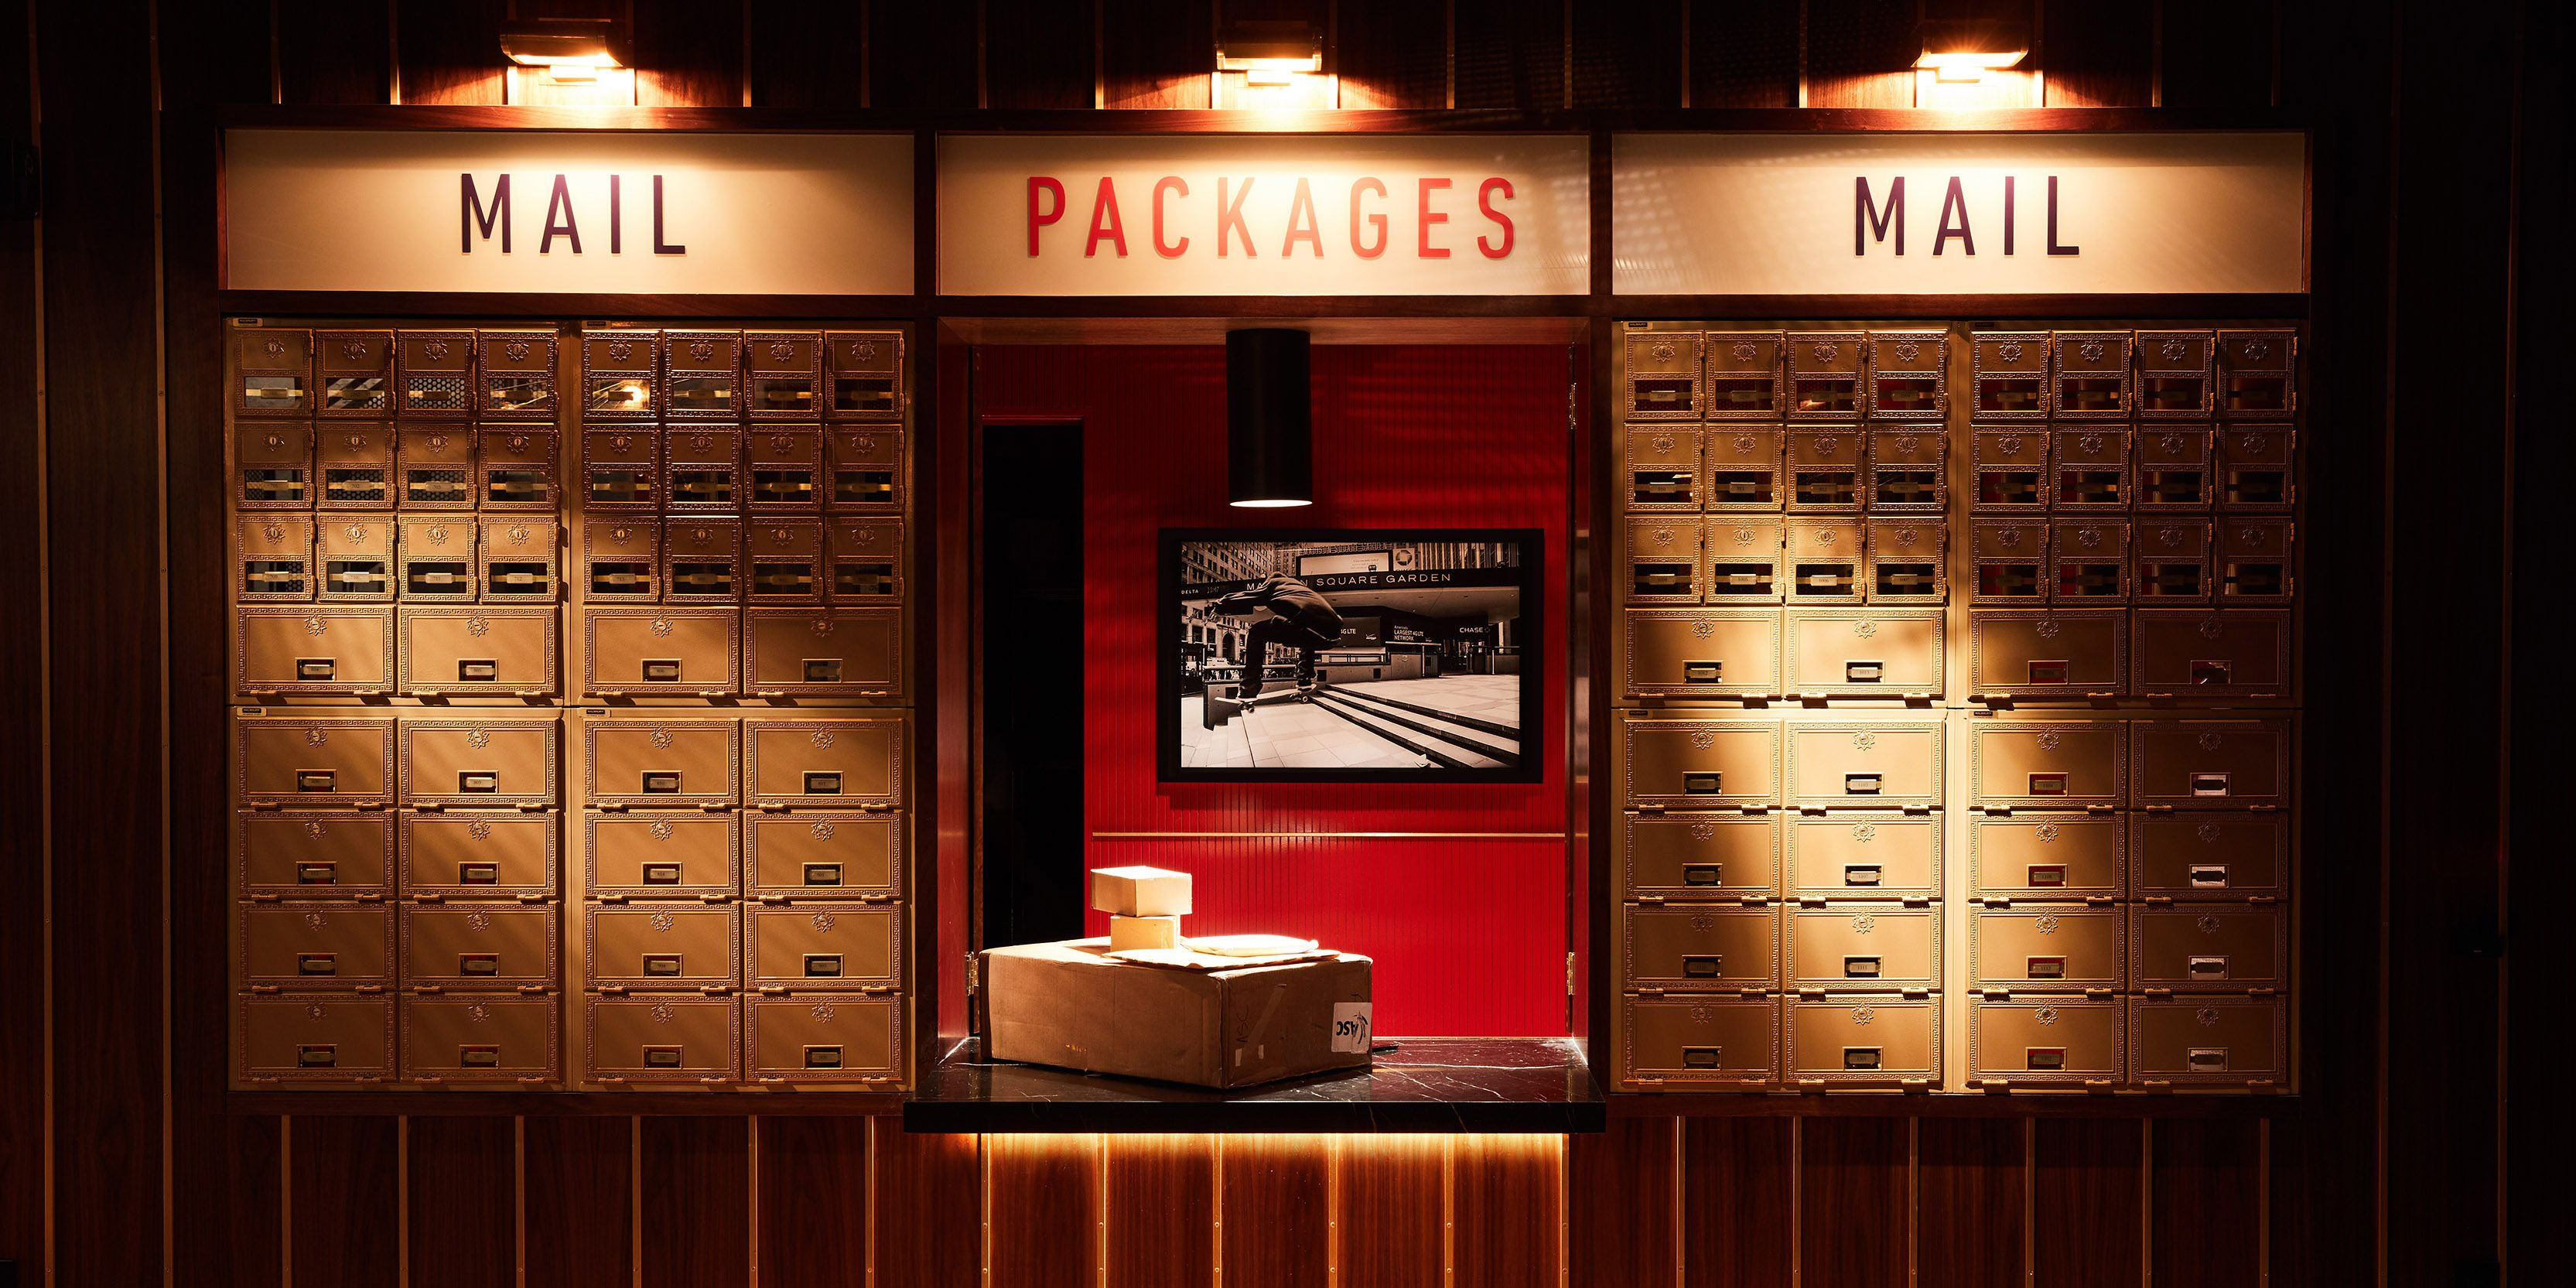 Mailroom Bar NYC - Mailroom Financial District